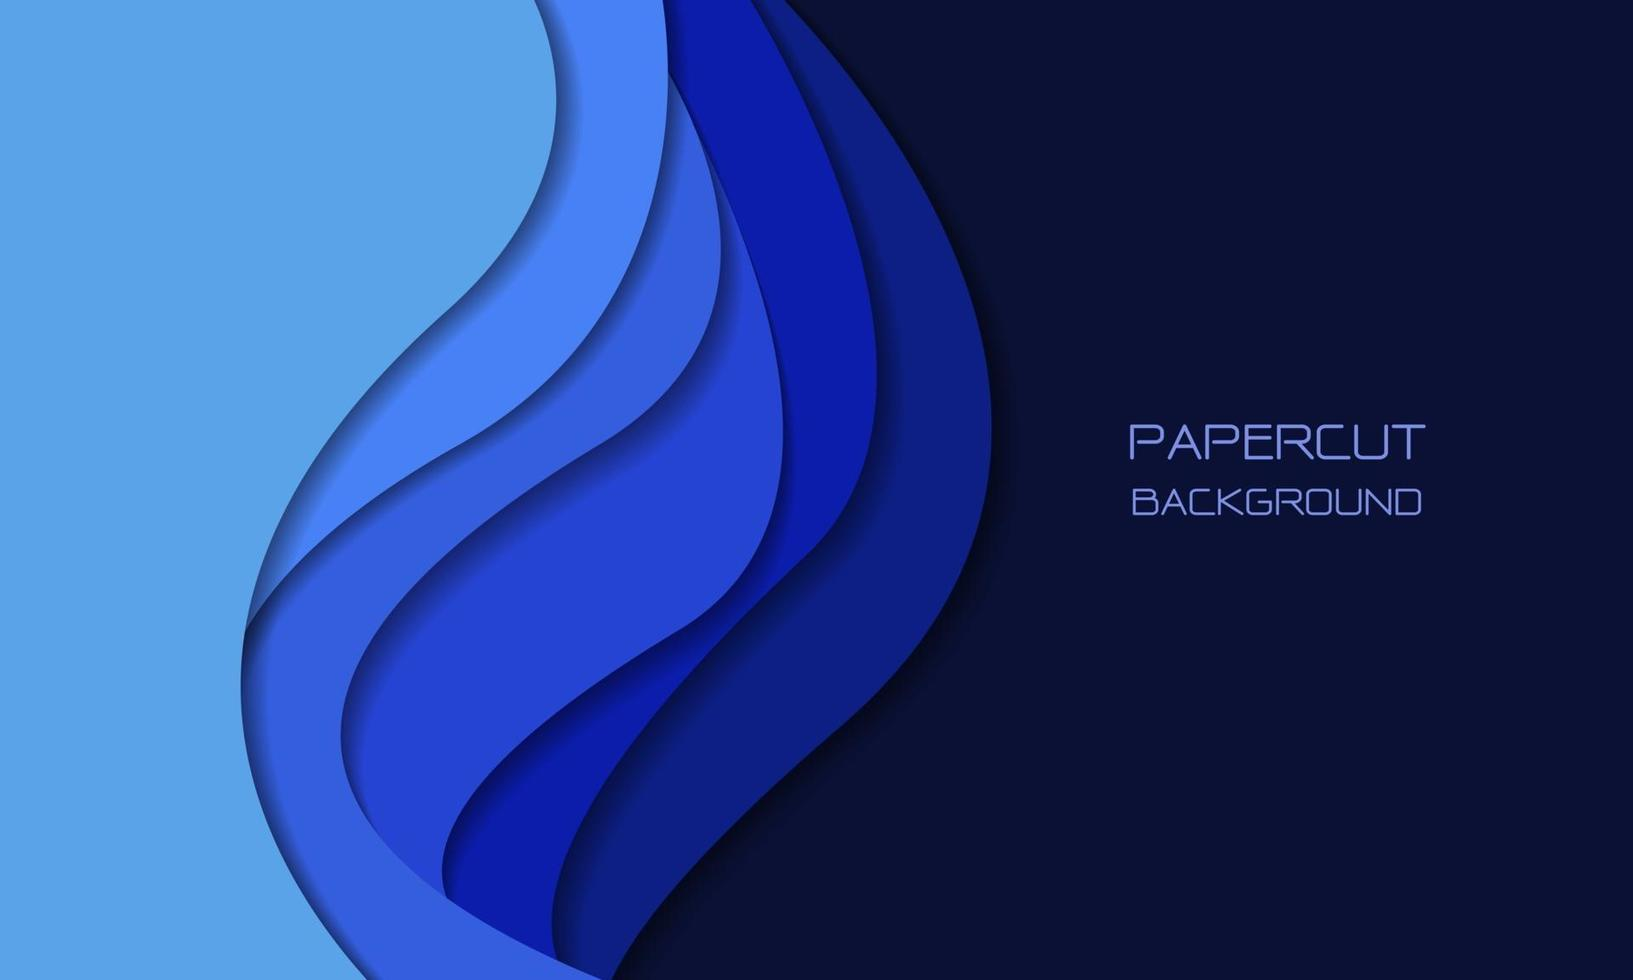 abstrakt blå ton pappersskuren 3d lager överlappar konst med tomt utrymme design modern futuristisk bakgrundsstruktur vektorillustration. vektor